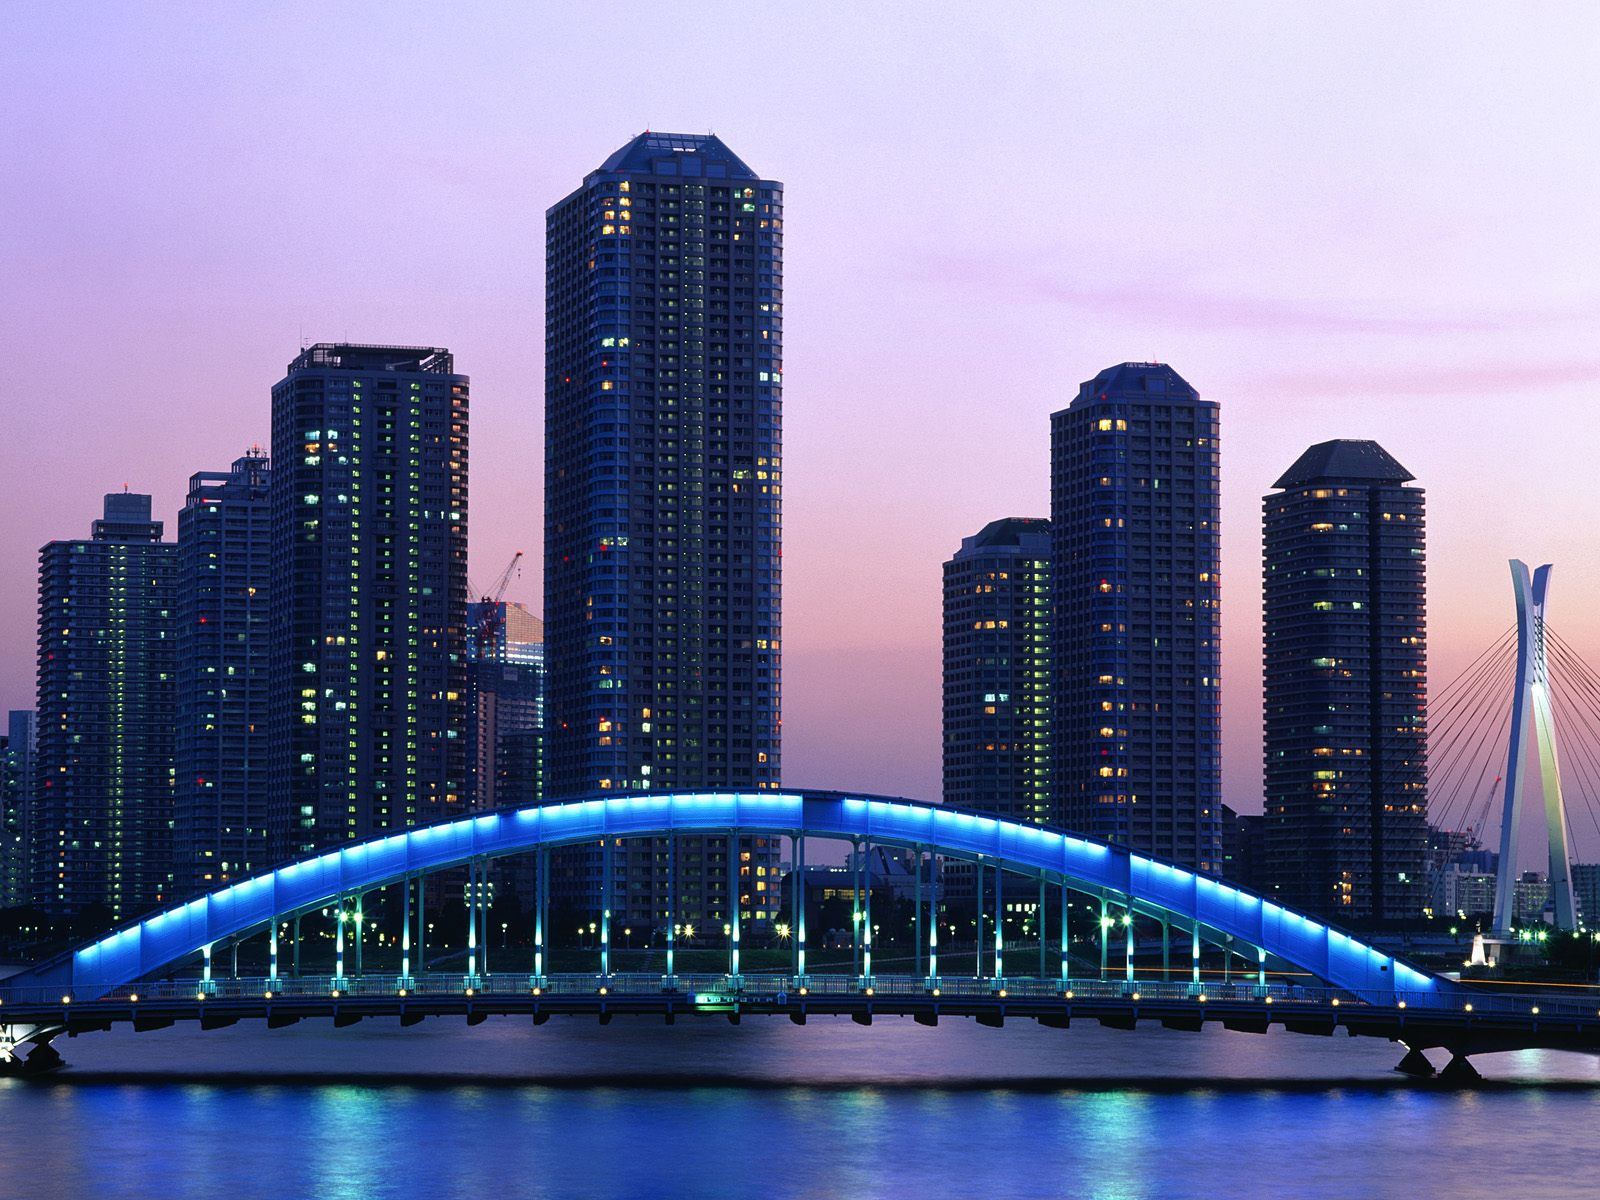 of japan bridge - photo #15